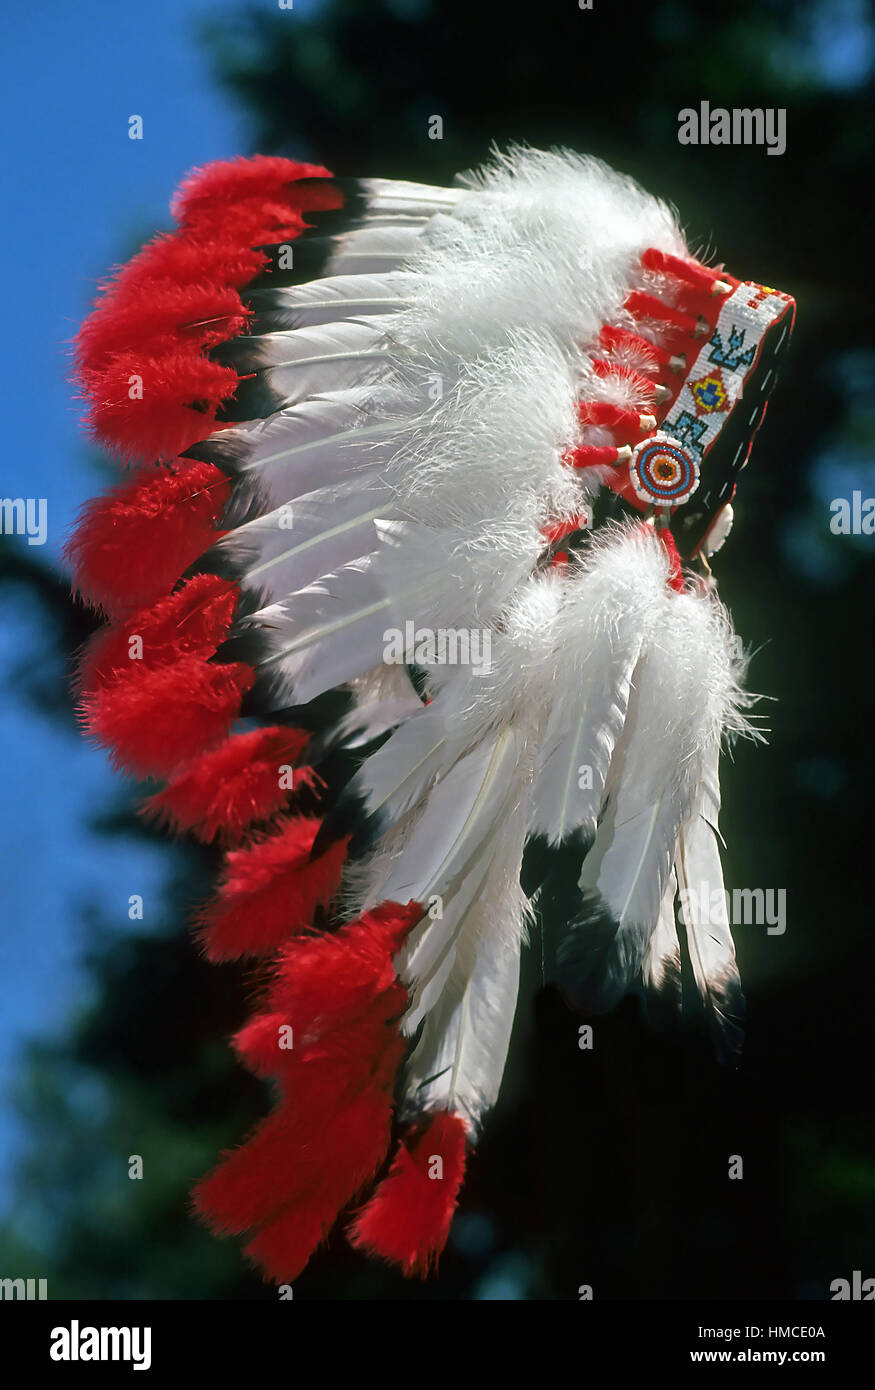 Muscogee Native American war bonnet. - Stock Image